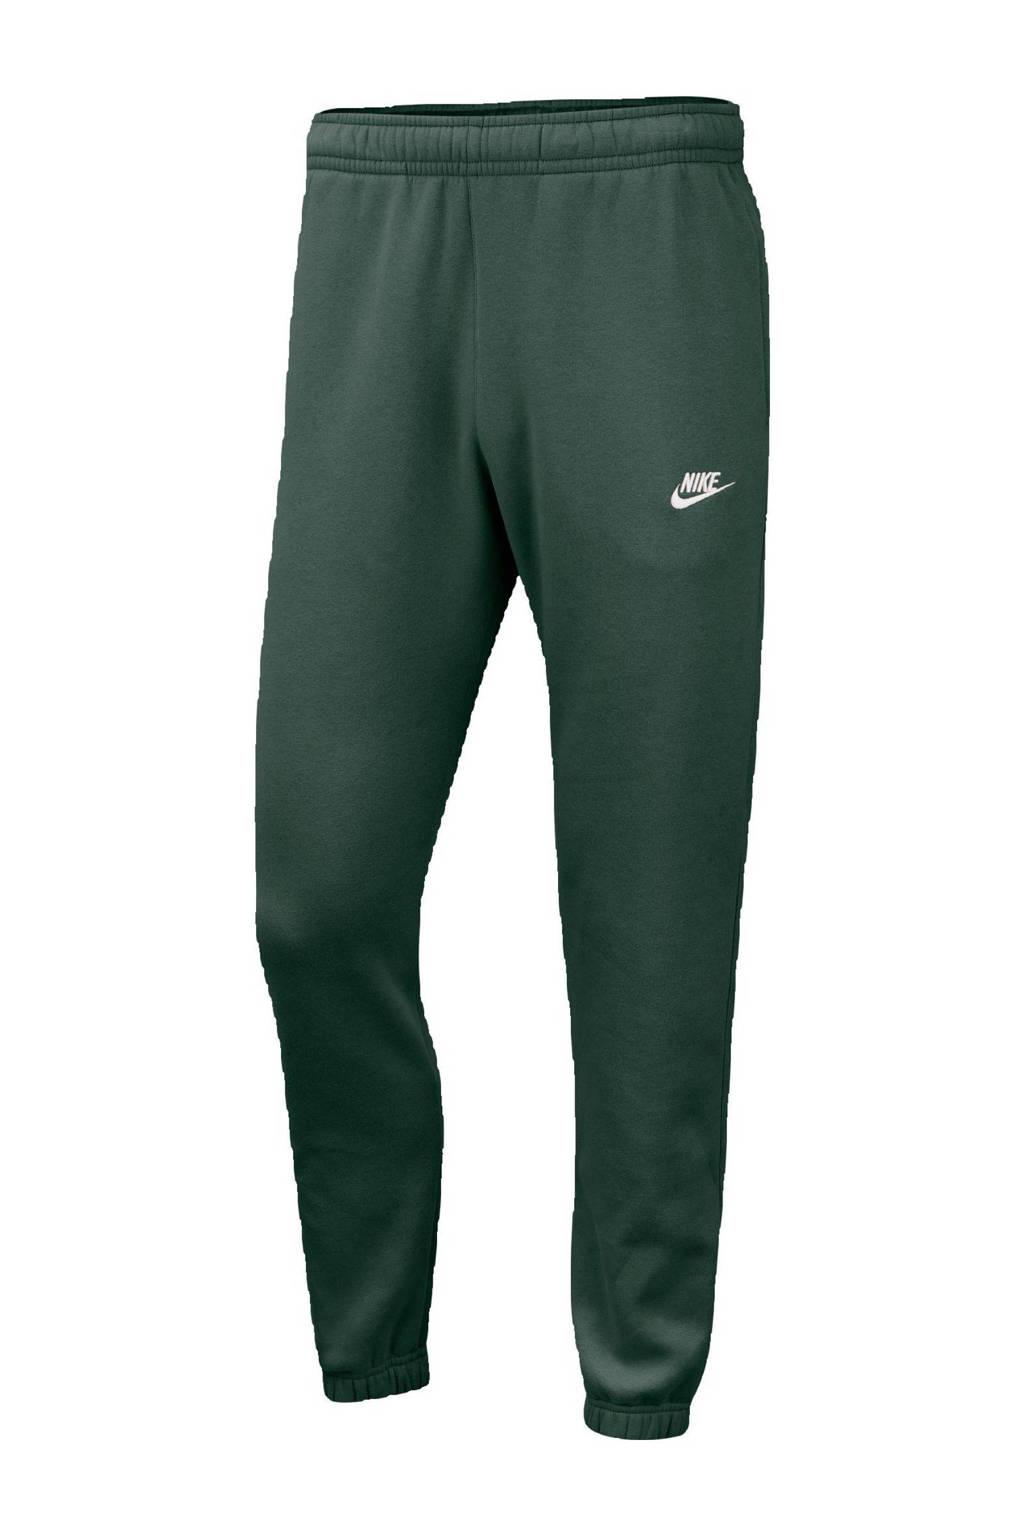 Nike regular fit joggingbroek donkergroen, Donkergroen/wit